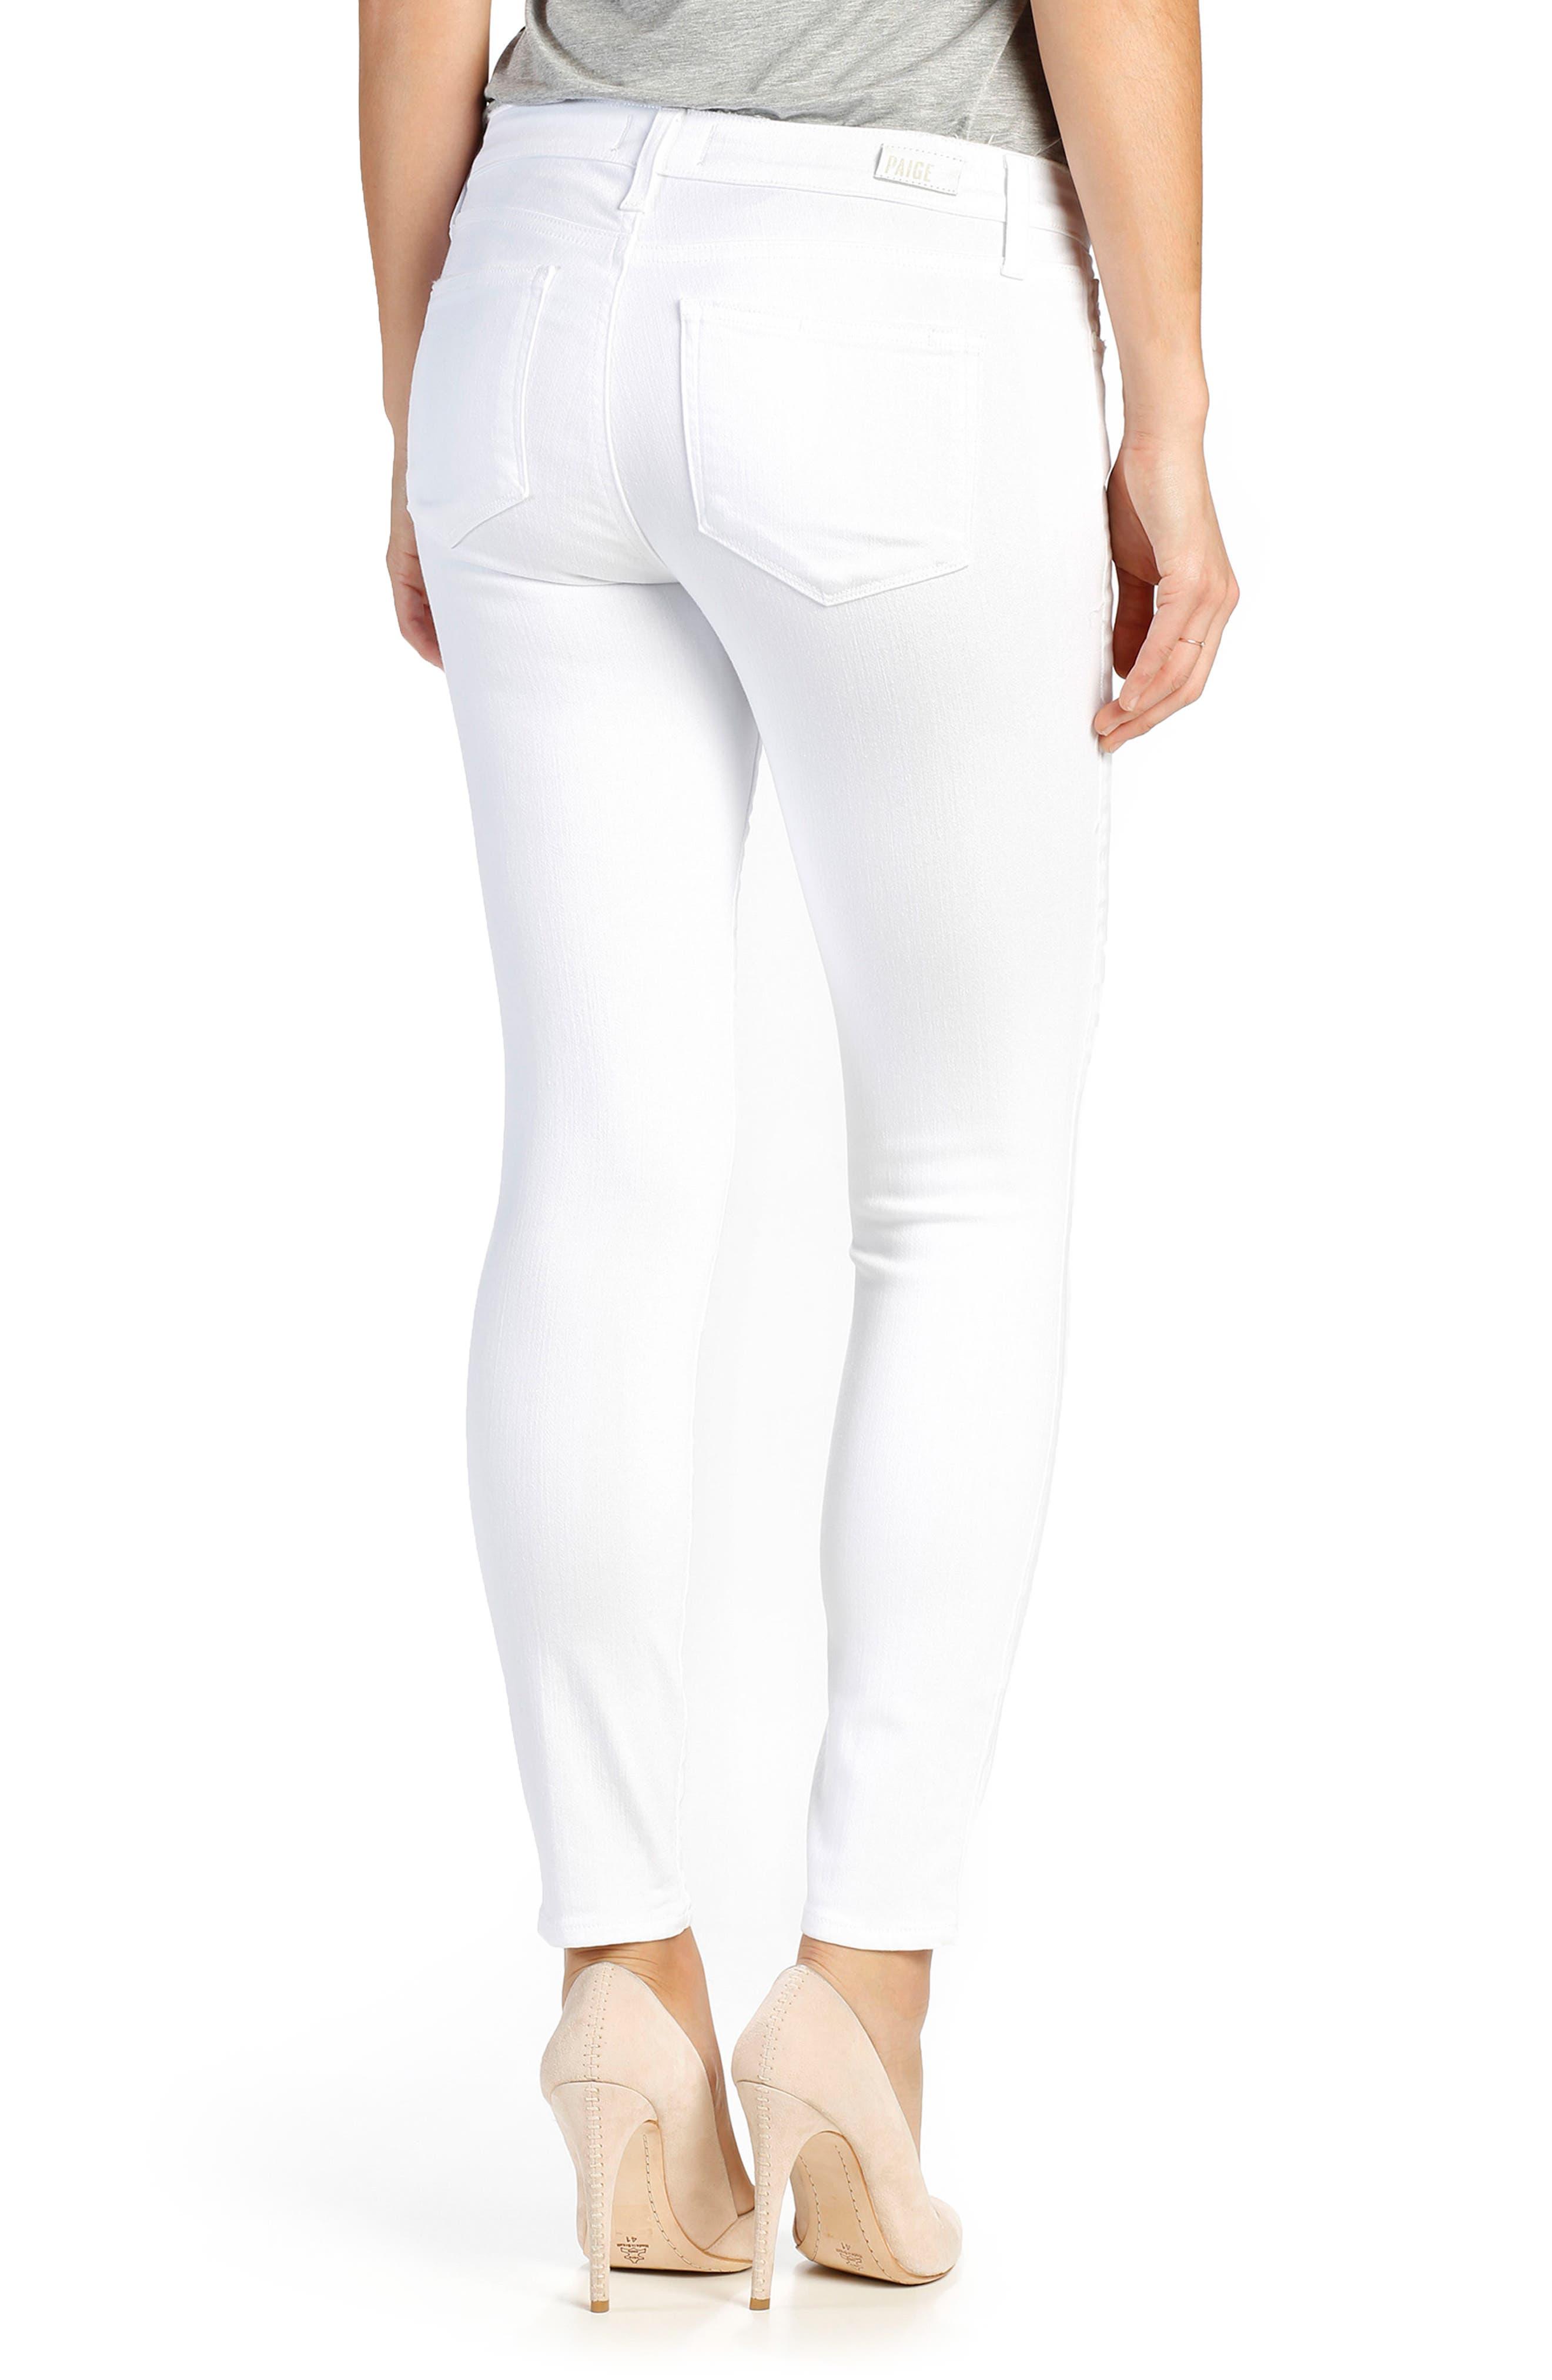 PAIGE, Verdugo Ankle Skinny Jeans, Alternate thumbnail 3, color, 100